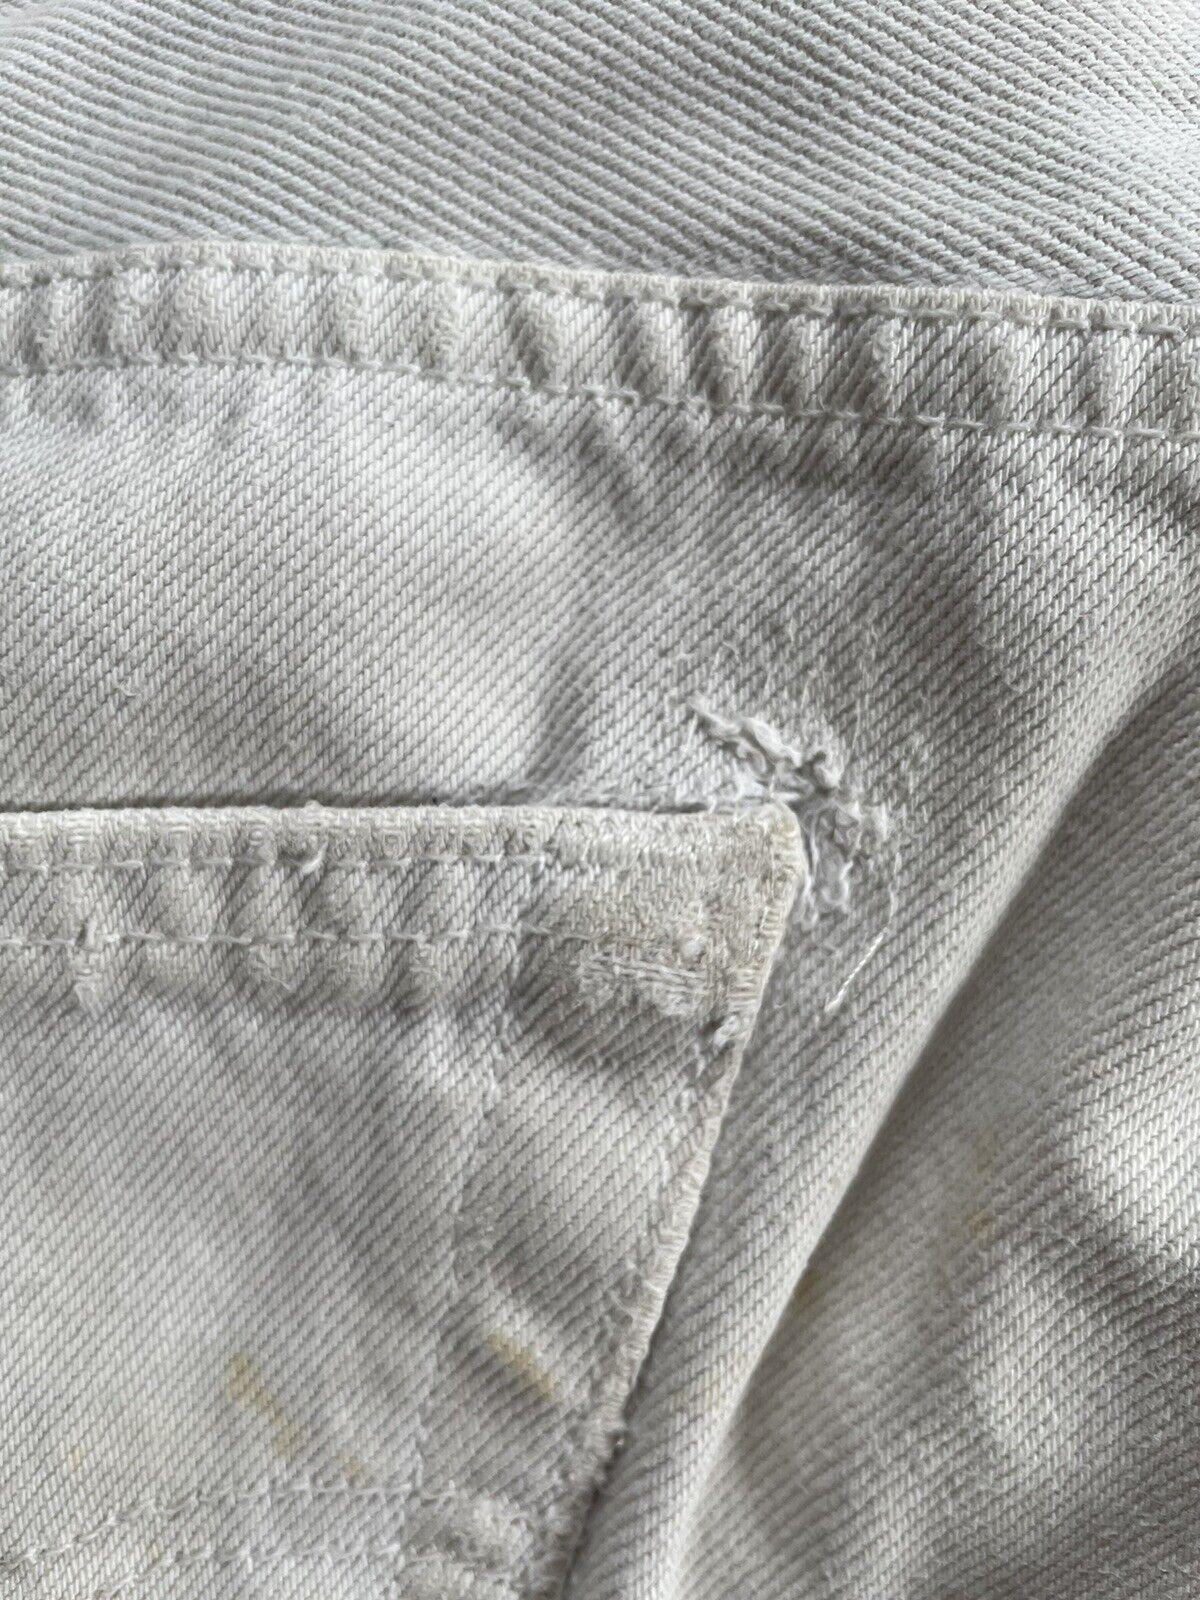 Vintage Levi's 501 Custom Distressed White Denim … - image 9